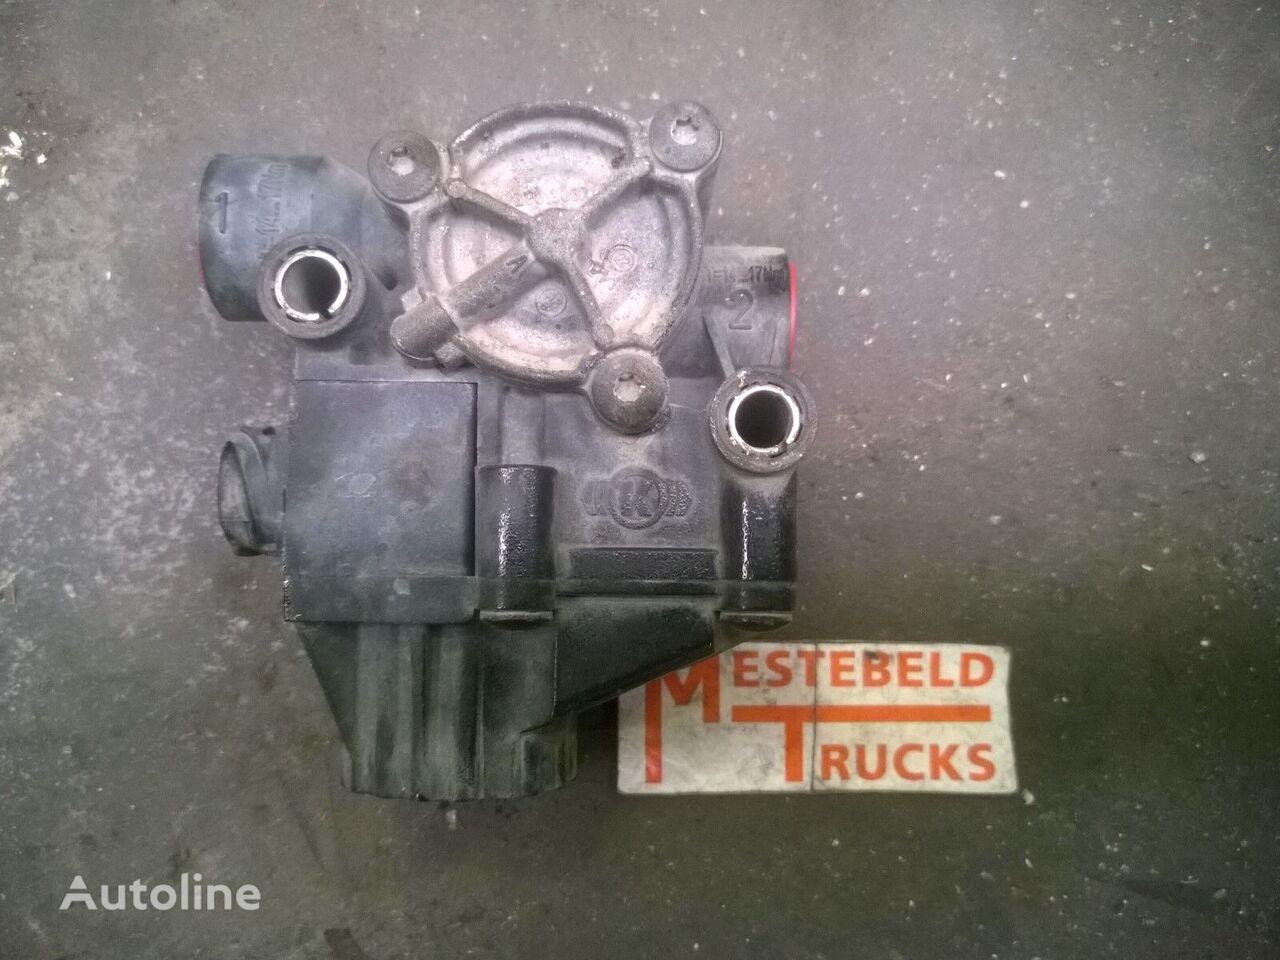 клапан MAN ABS magneetventiel для грузовика MAN ABS magneetventiel L2000